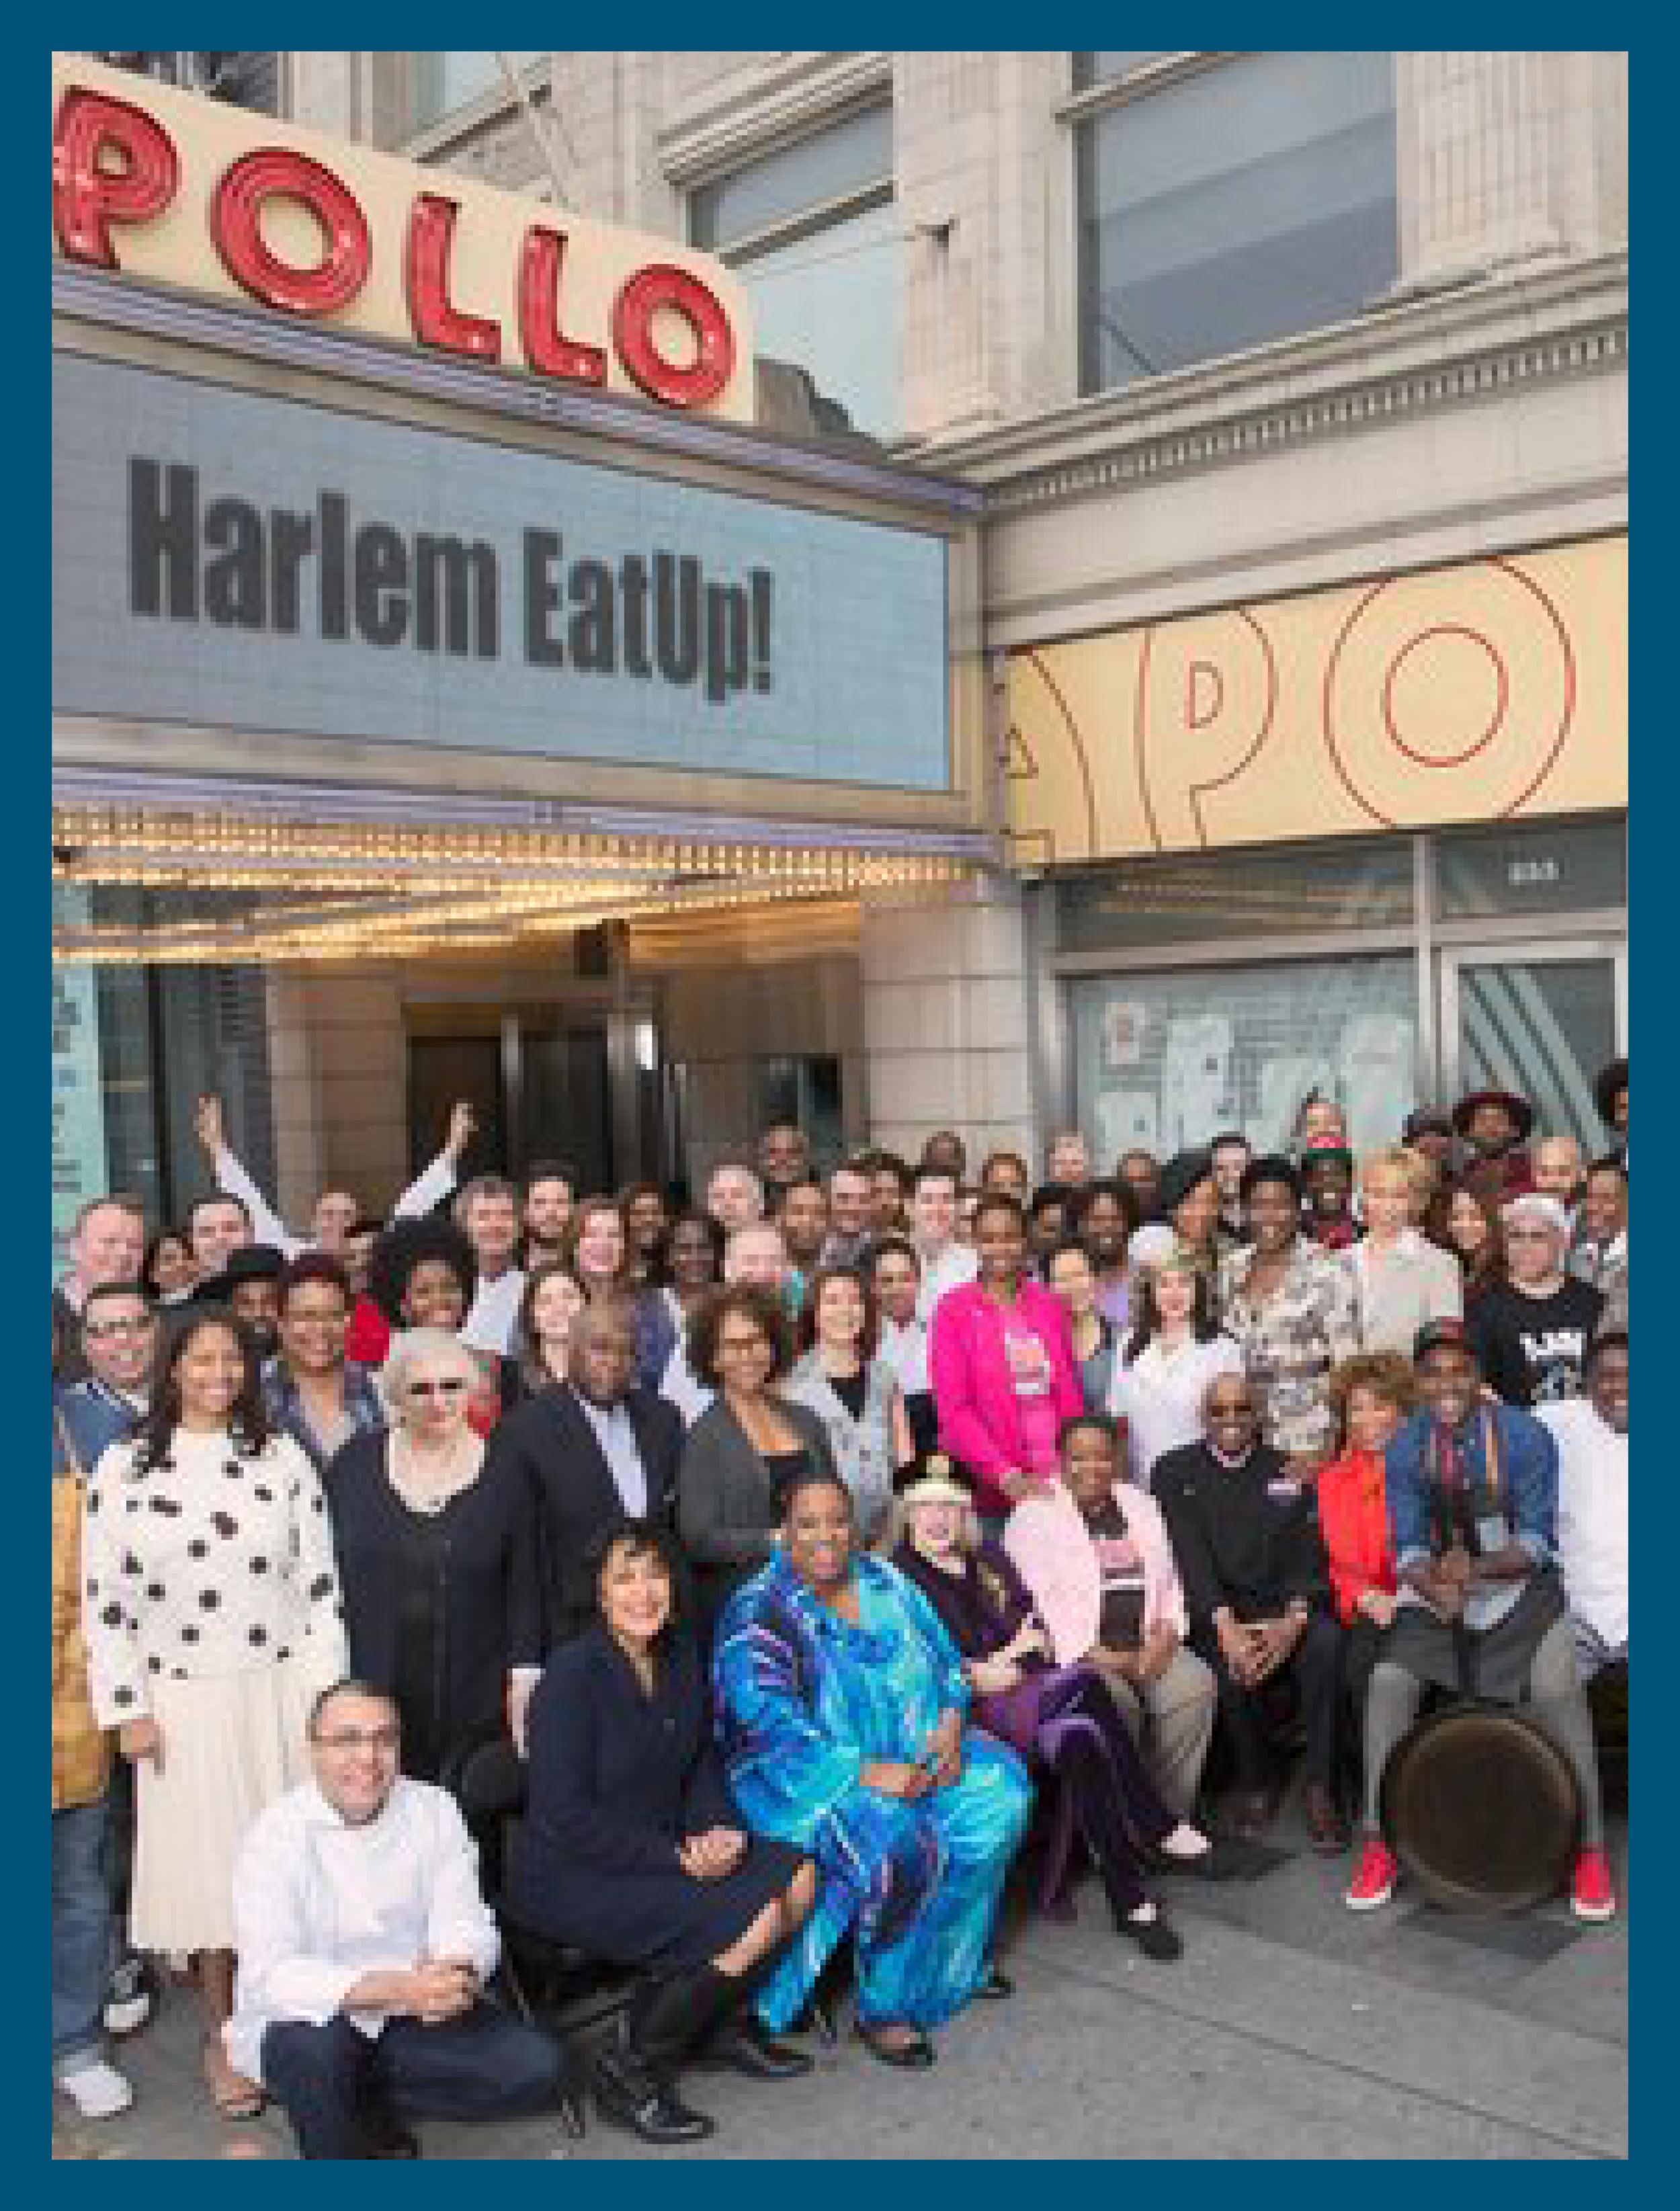 <strong> Harlem Eatup!<br>Festival</strong>